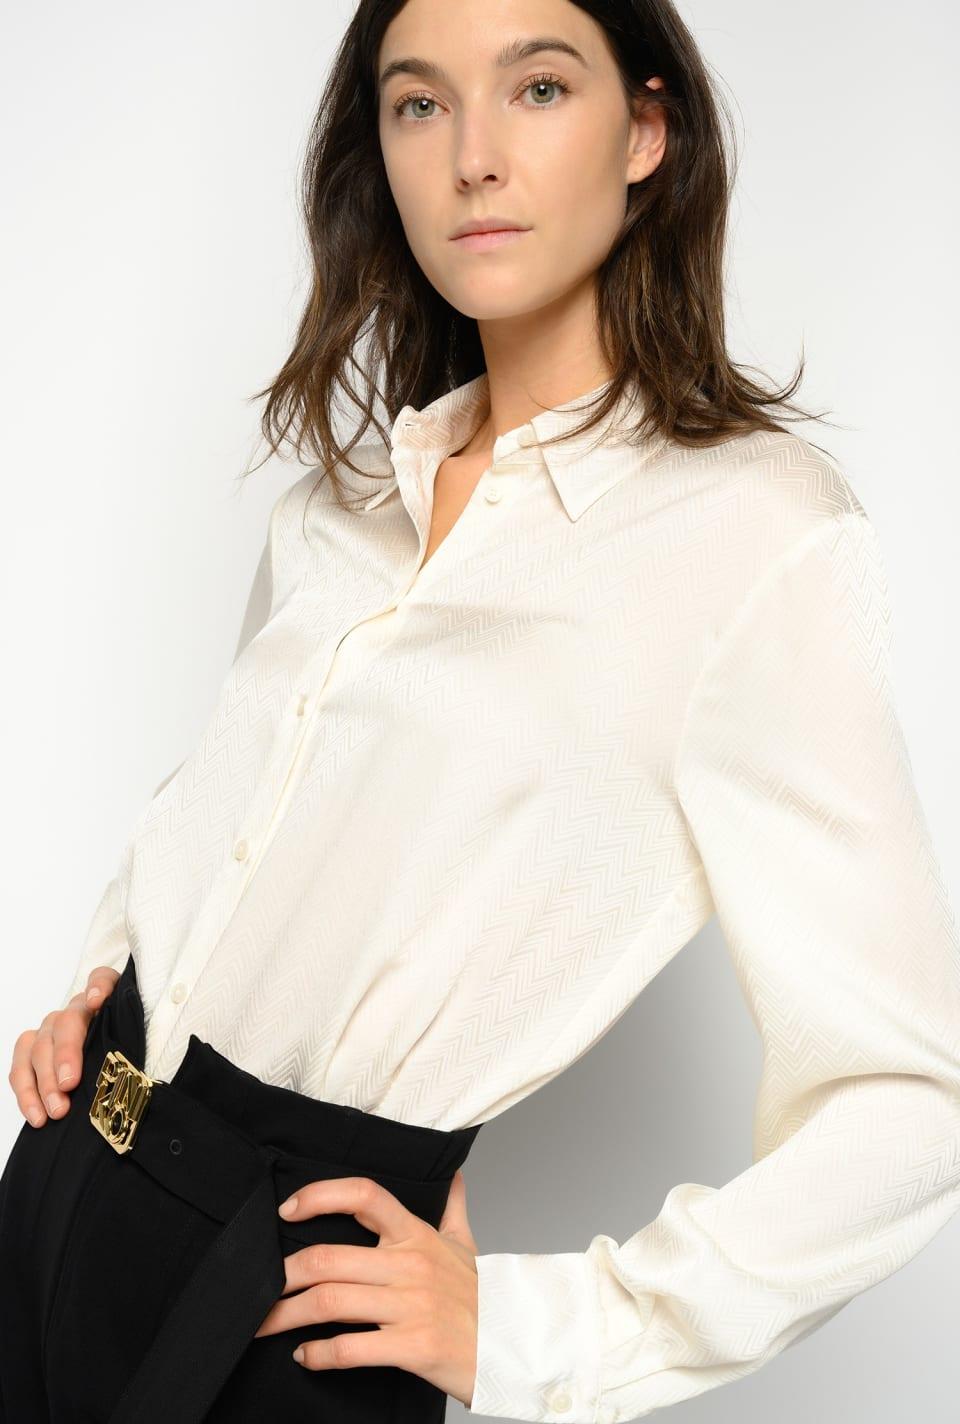 Chevron jacquard shirt - Pinko